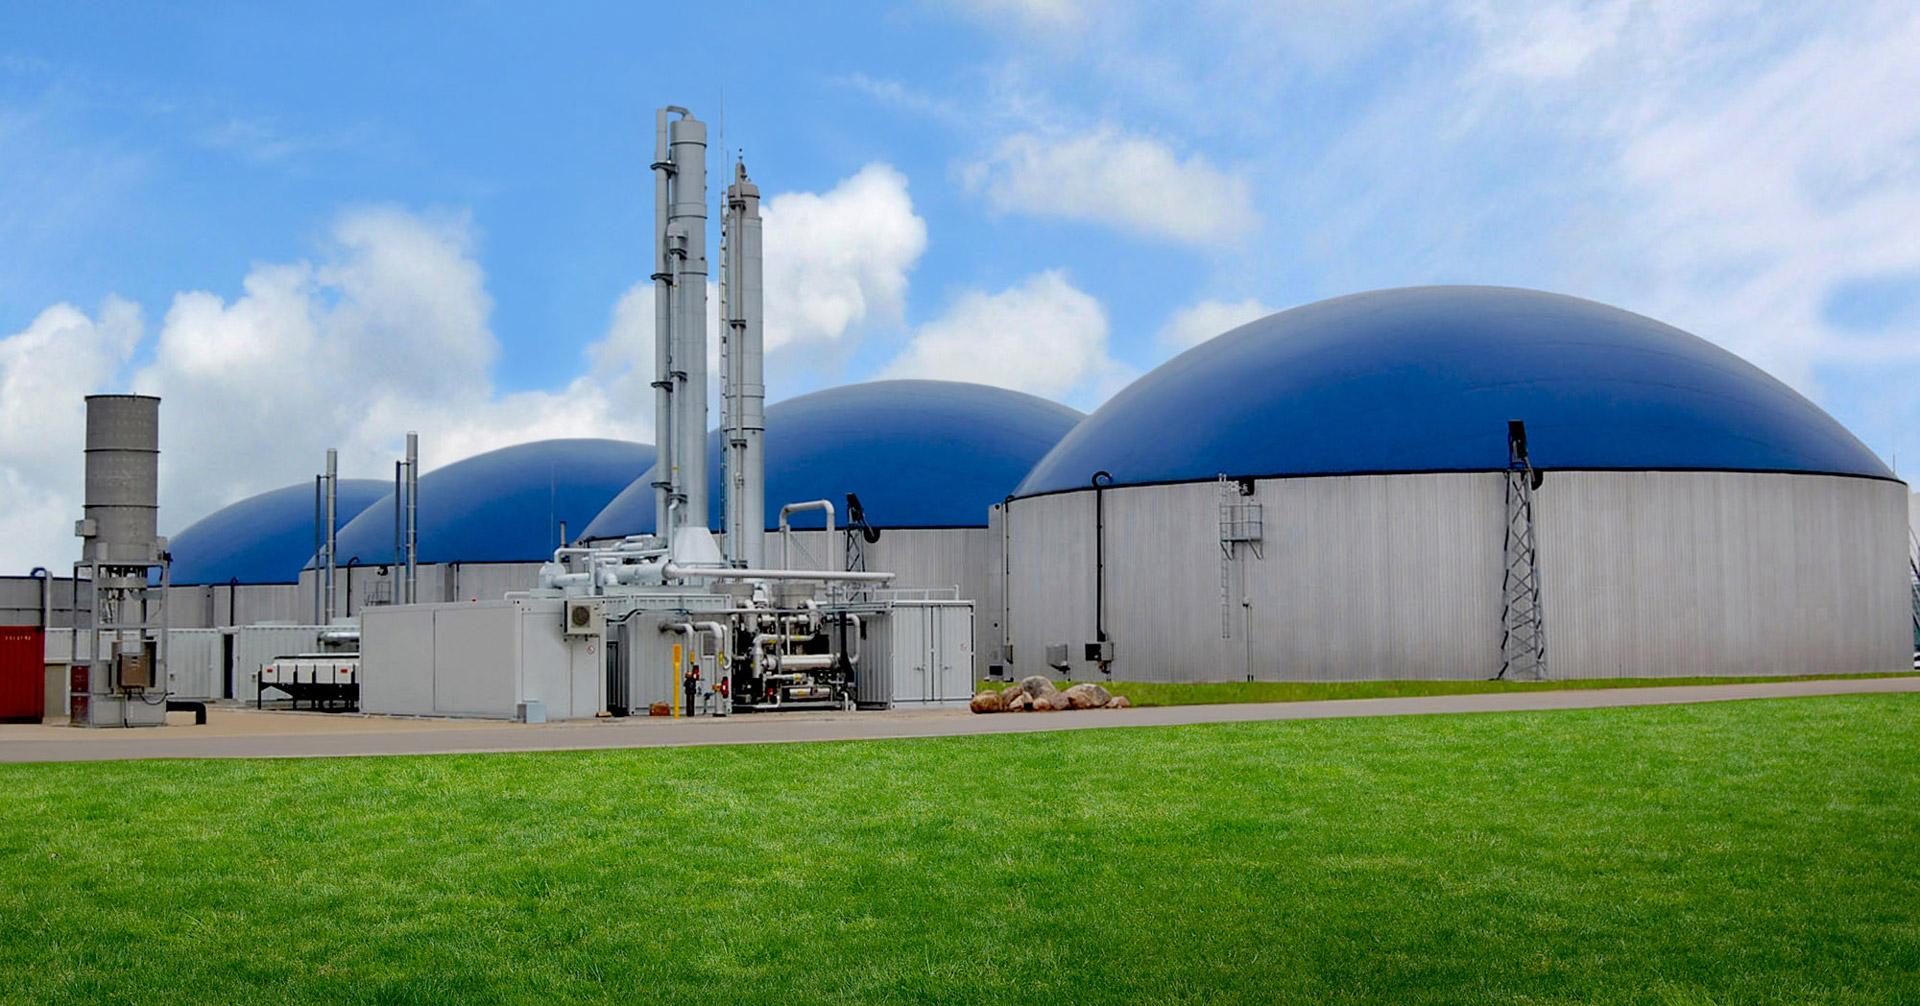 Come si produce energia dal Gas